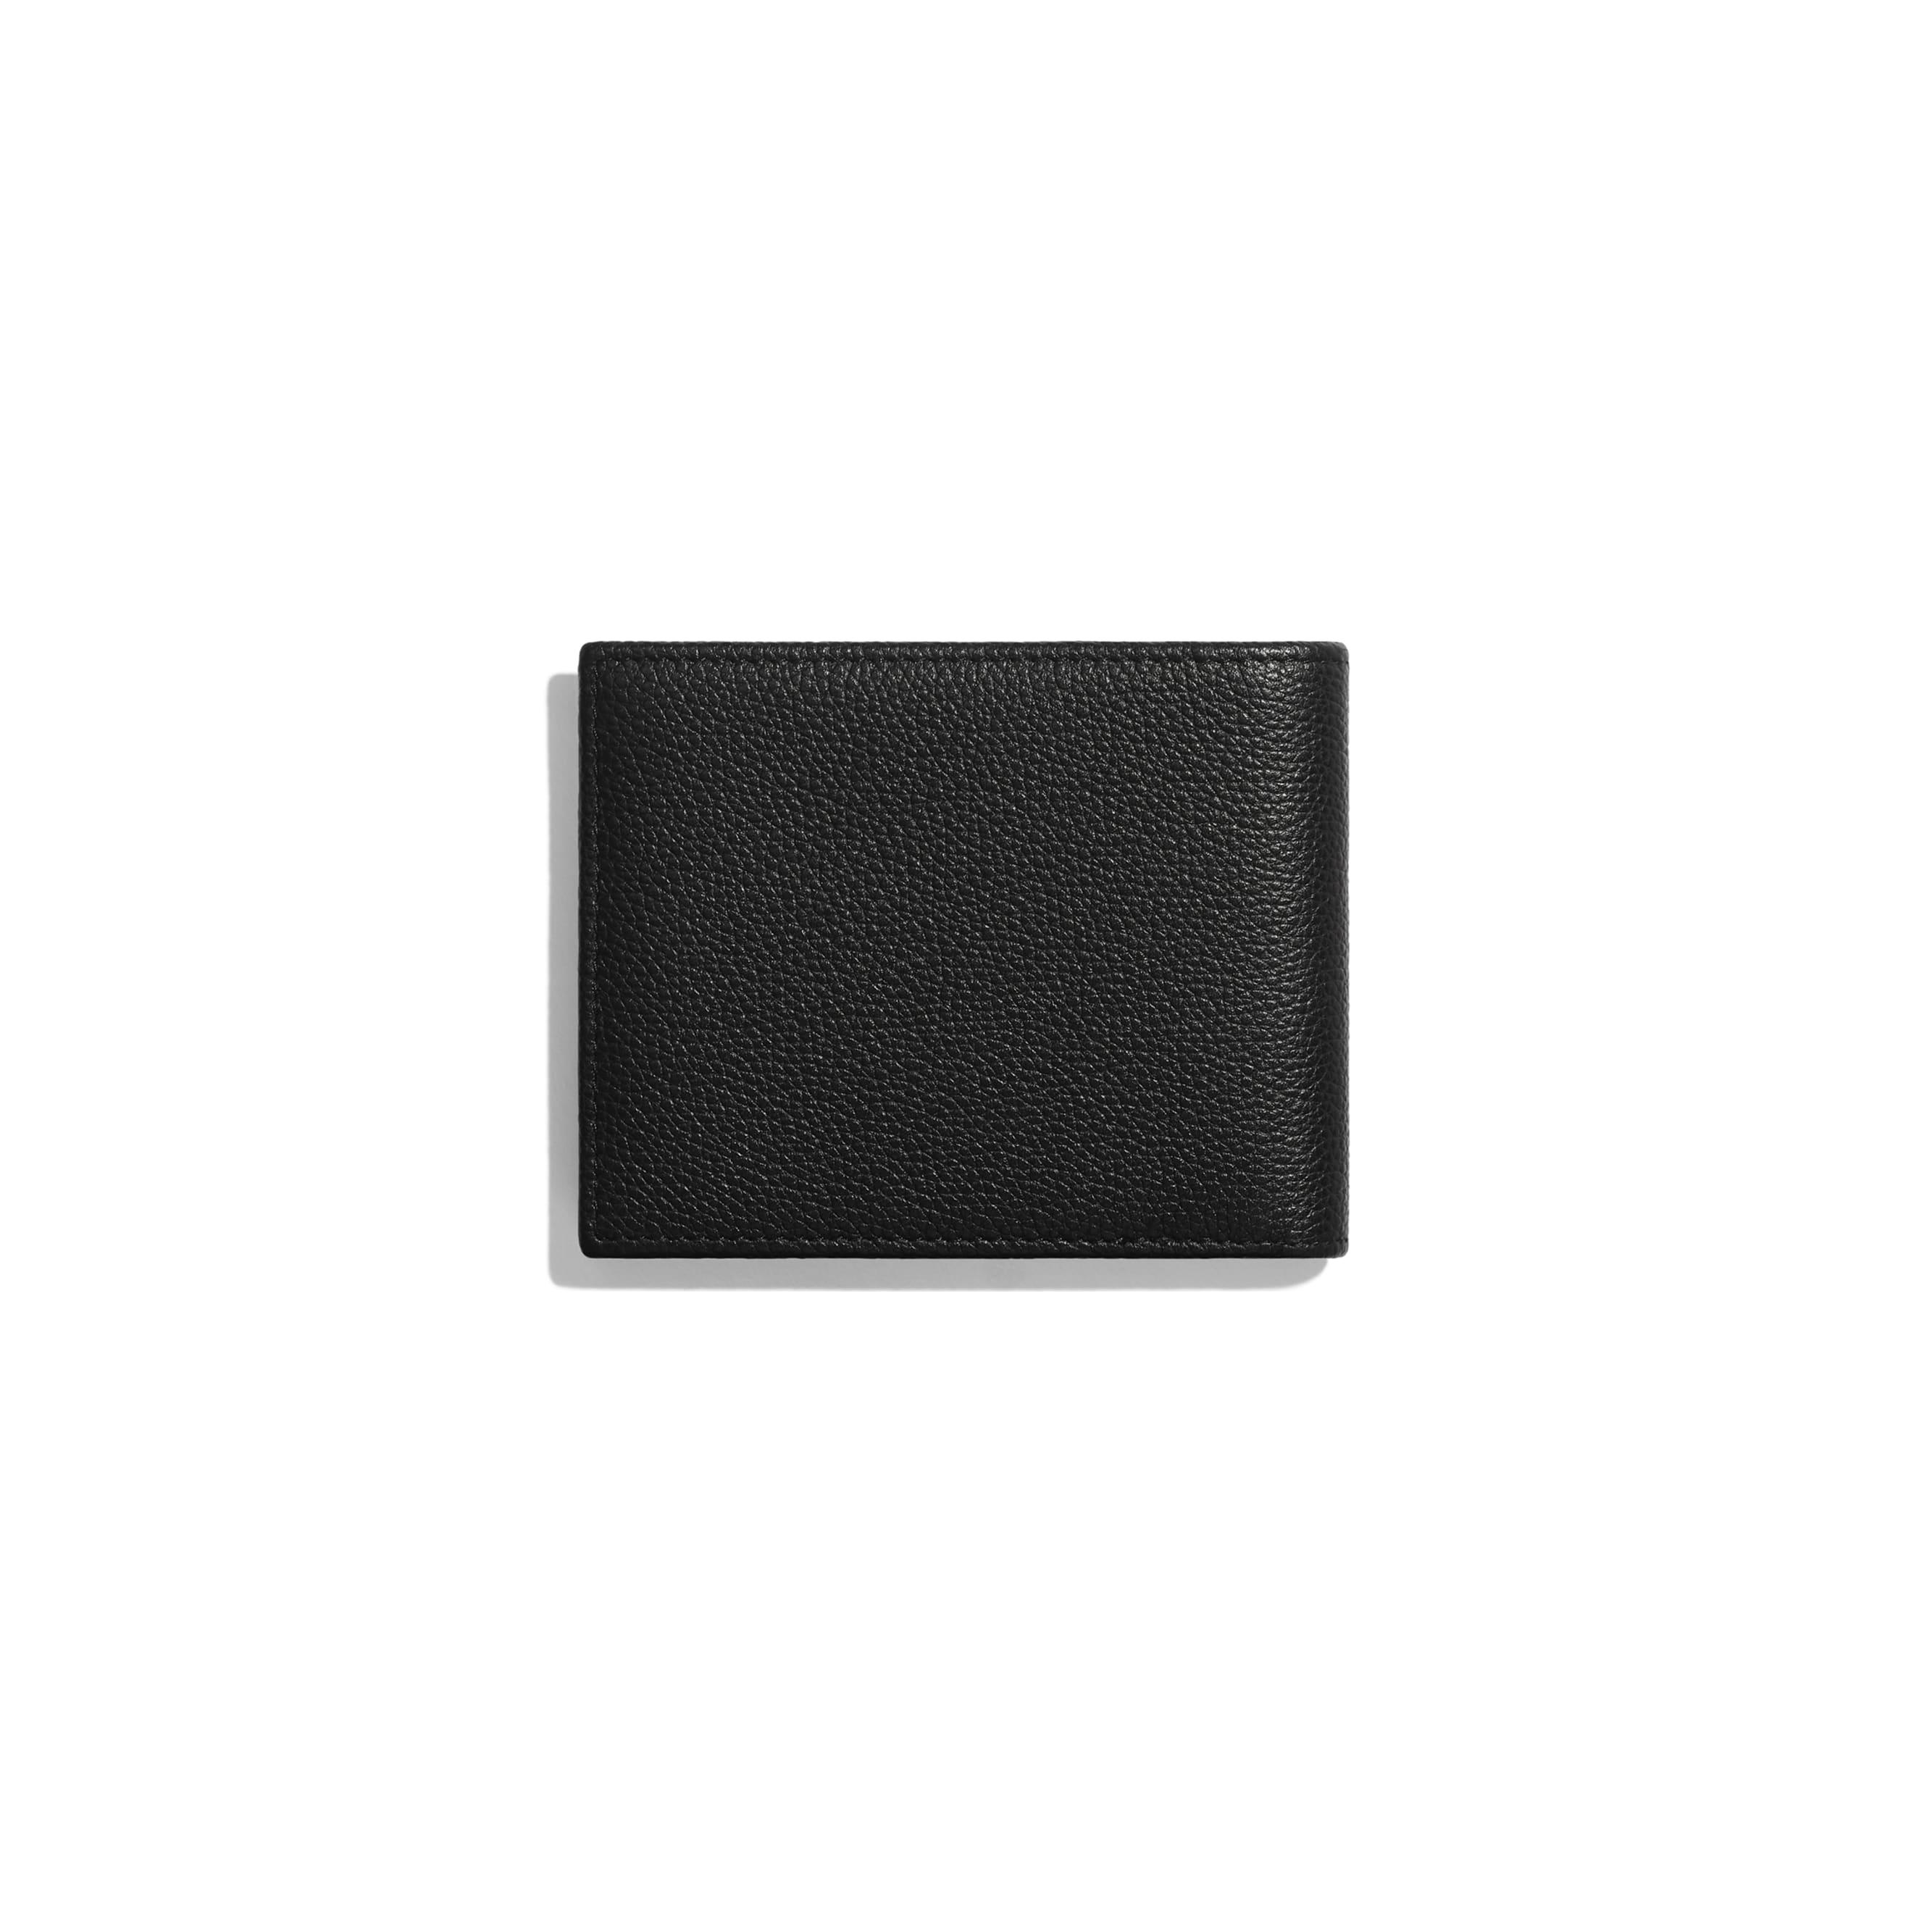 Small Flap Wallet - Black - Grained Calfskin & Ruthenium-Finish Metal - Alternative view - see standard sized version